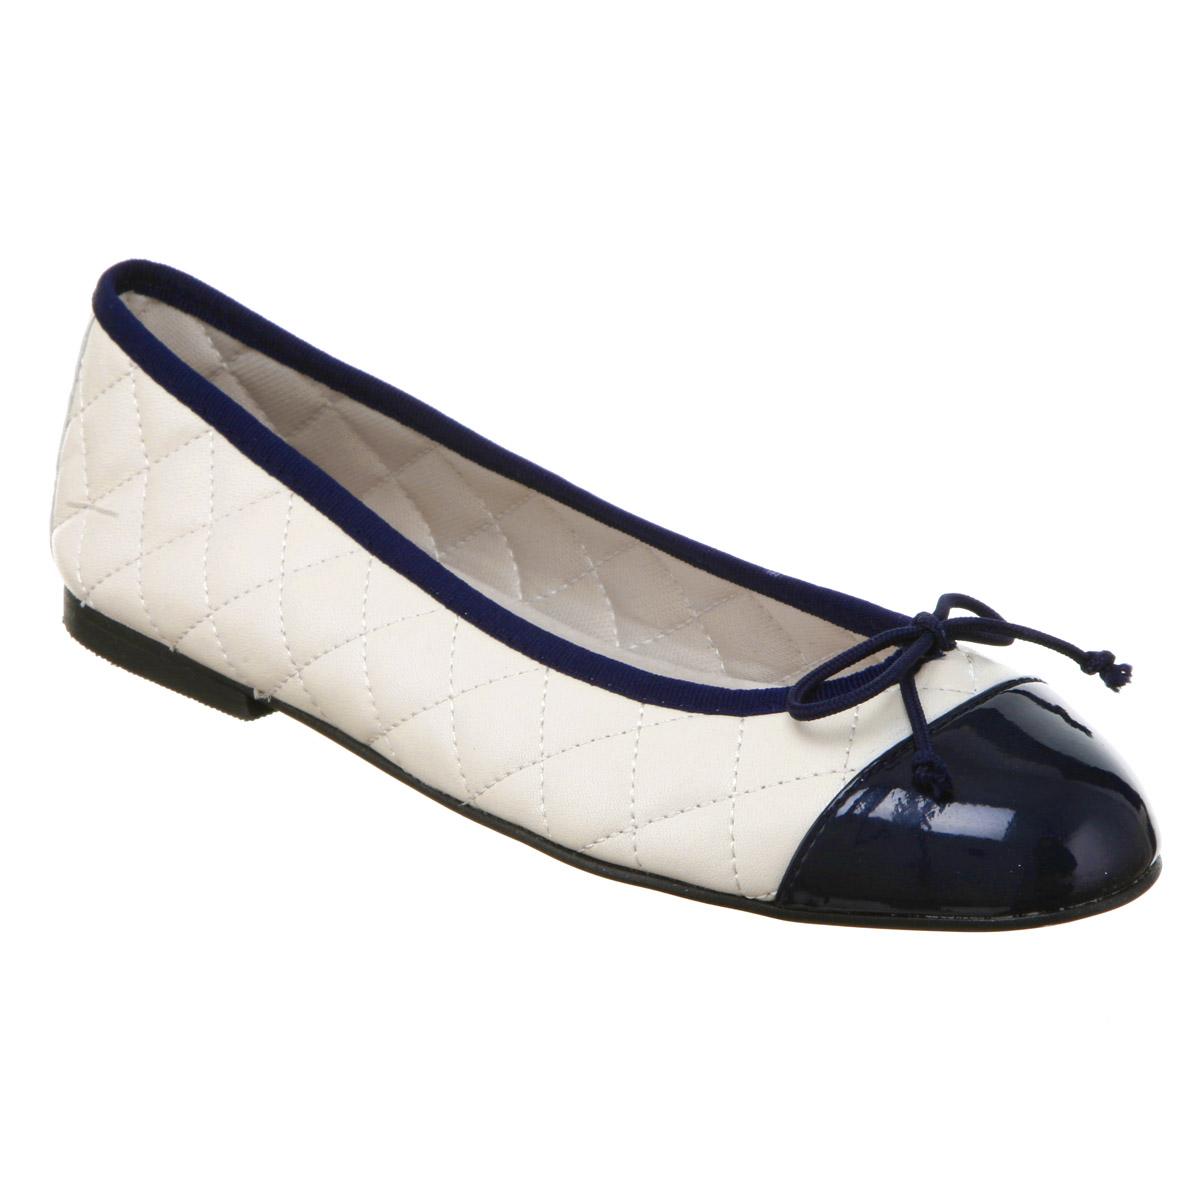 f239a00268e34 Image is loading Office-Cecilia-Toe-Cap-Ballerina-Navy-Blue-Cream-